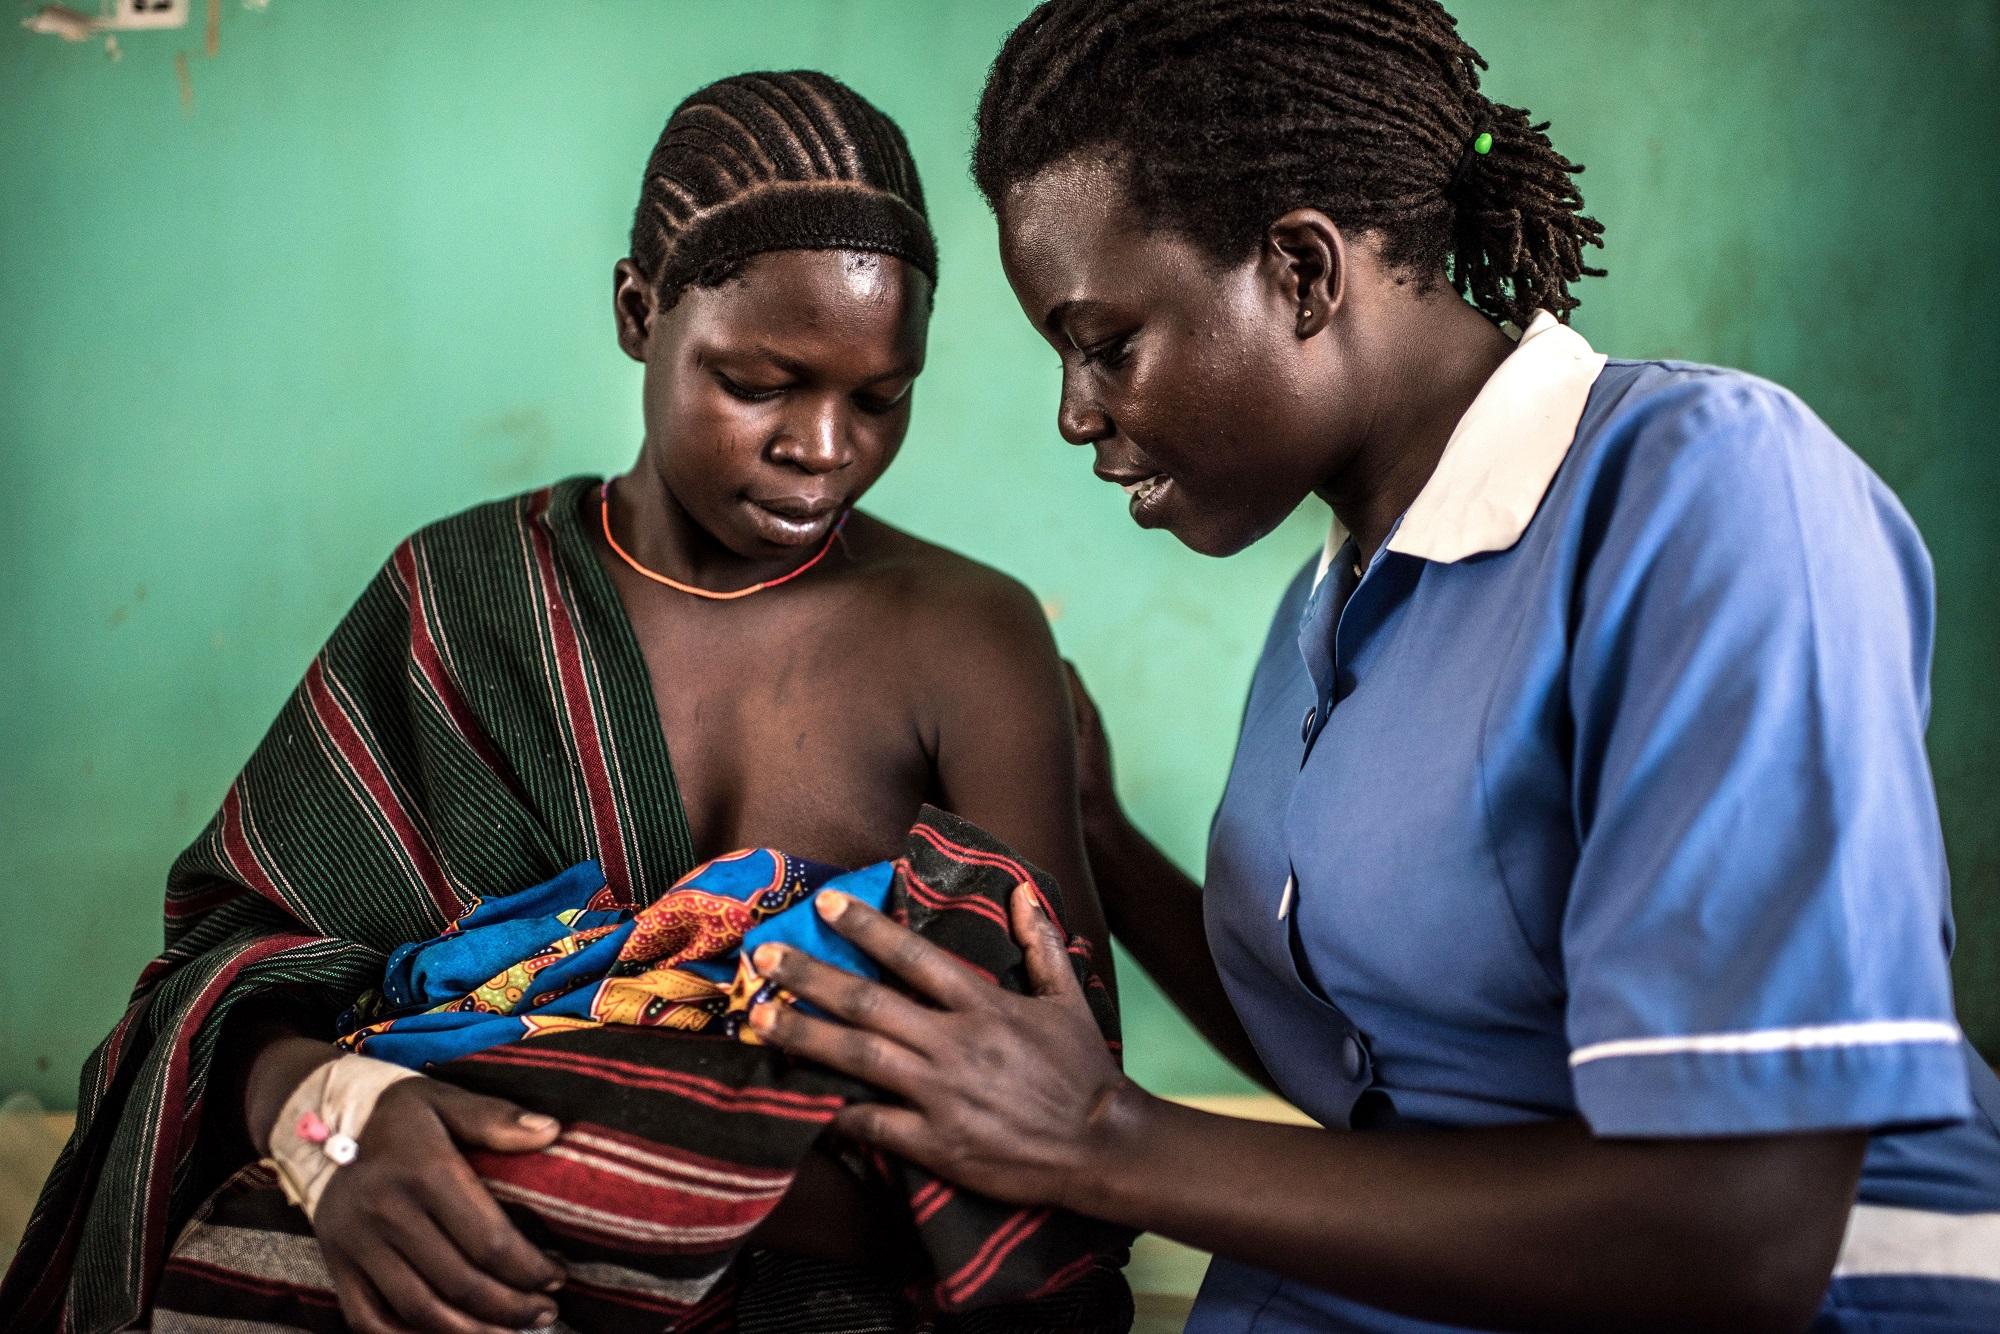 Munges Veronica, 24, holds her newborn baby, Teko, with Atim Jane, a 38 year old nursing officer at the Nadunget Health Center 3 in Karamoja, Uganda.